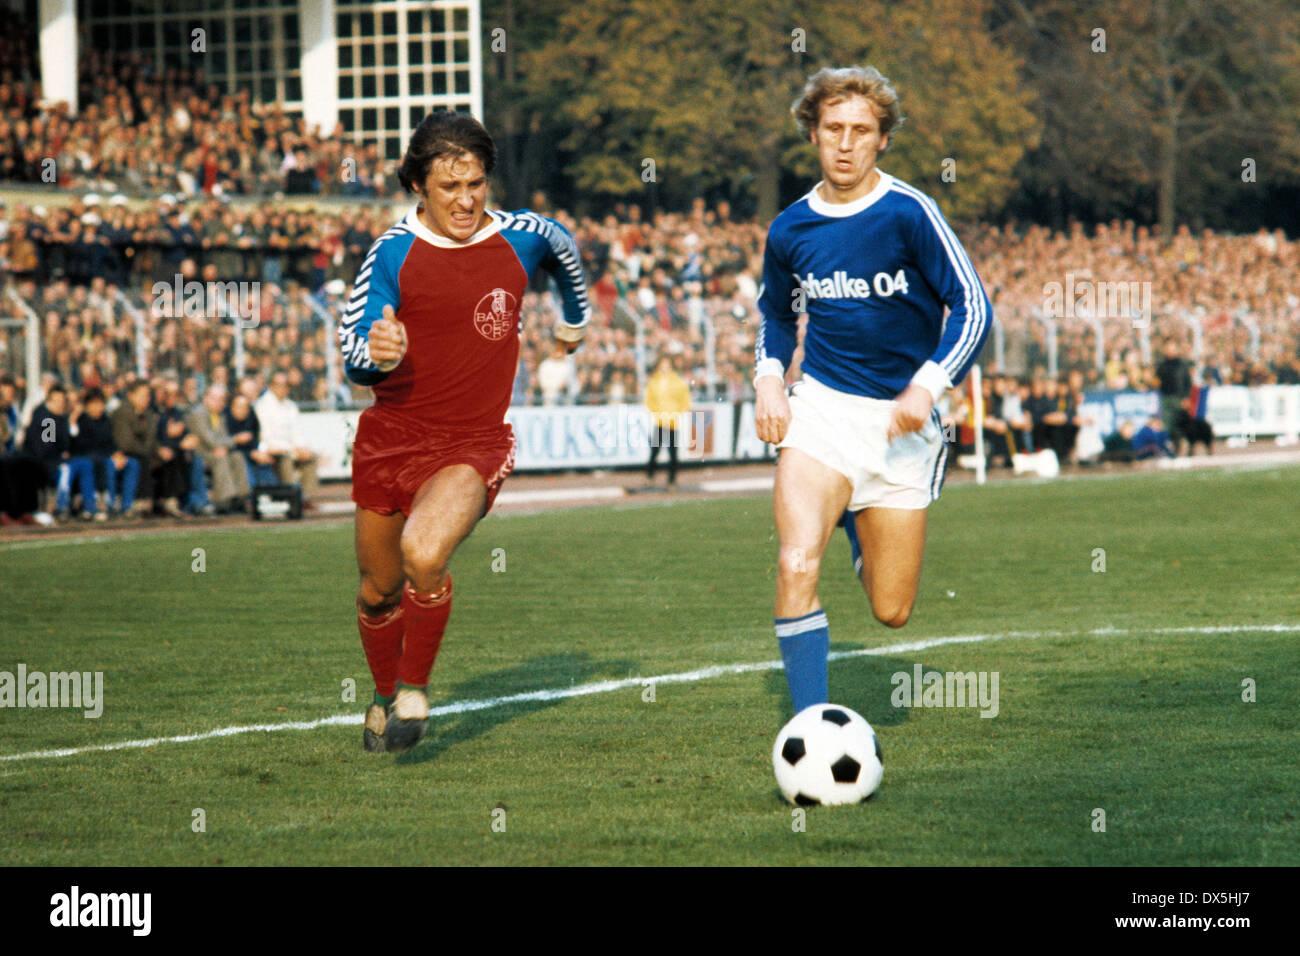 football, Bundesliga, 1975/1976, Grotenburg Stadium, FC Bayer 05 Uerdingen versus FC Schalke 04 3:2, scene of the match, Hans-Juergen Wloka (Uerdingen) left and Klaus Fichtel (S04) - Stock Image